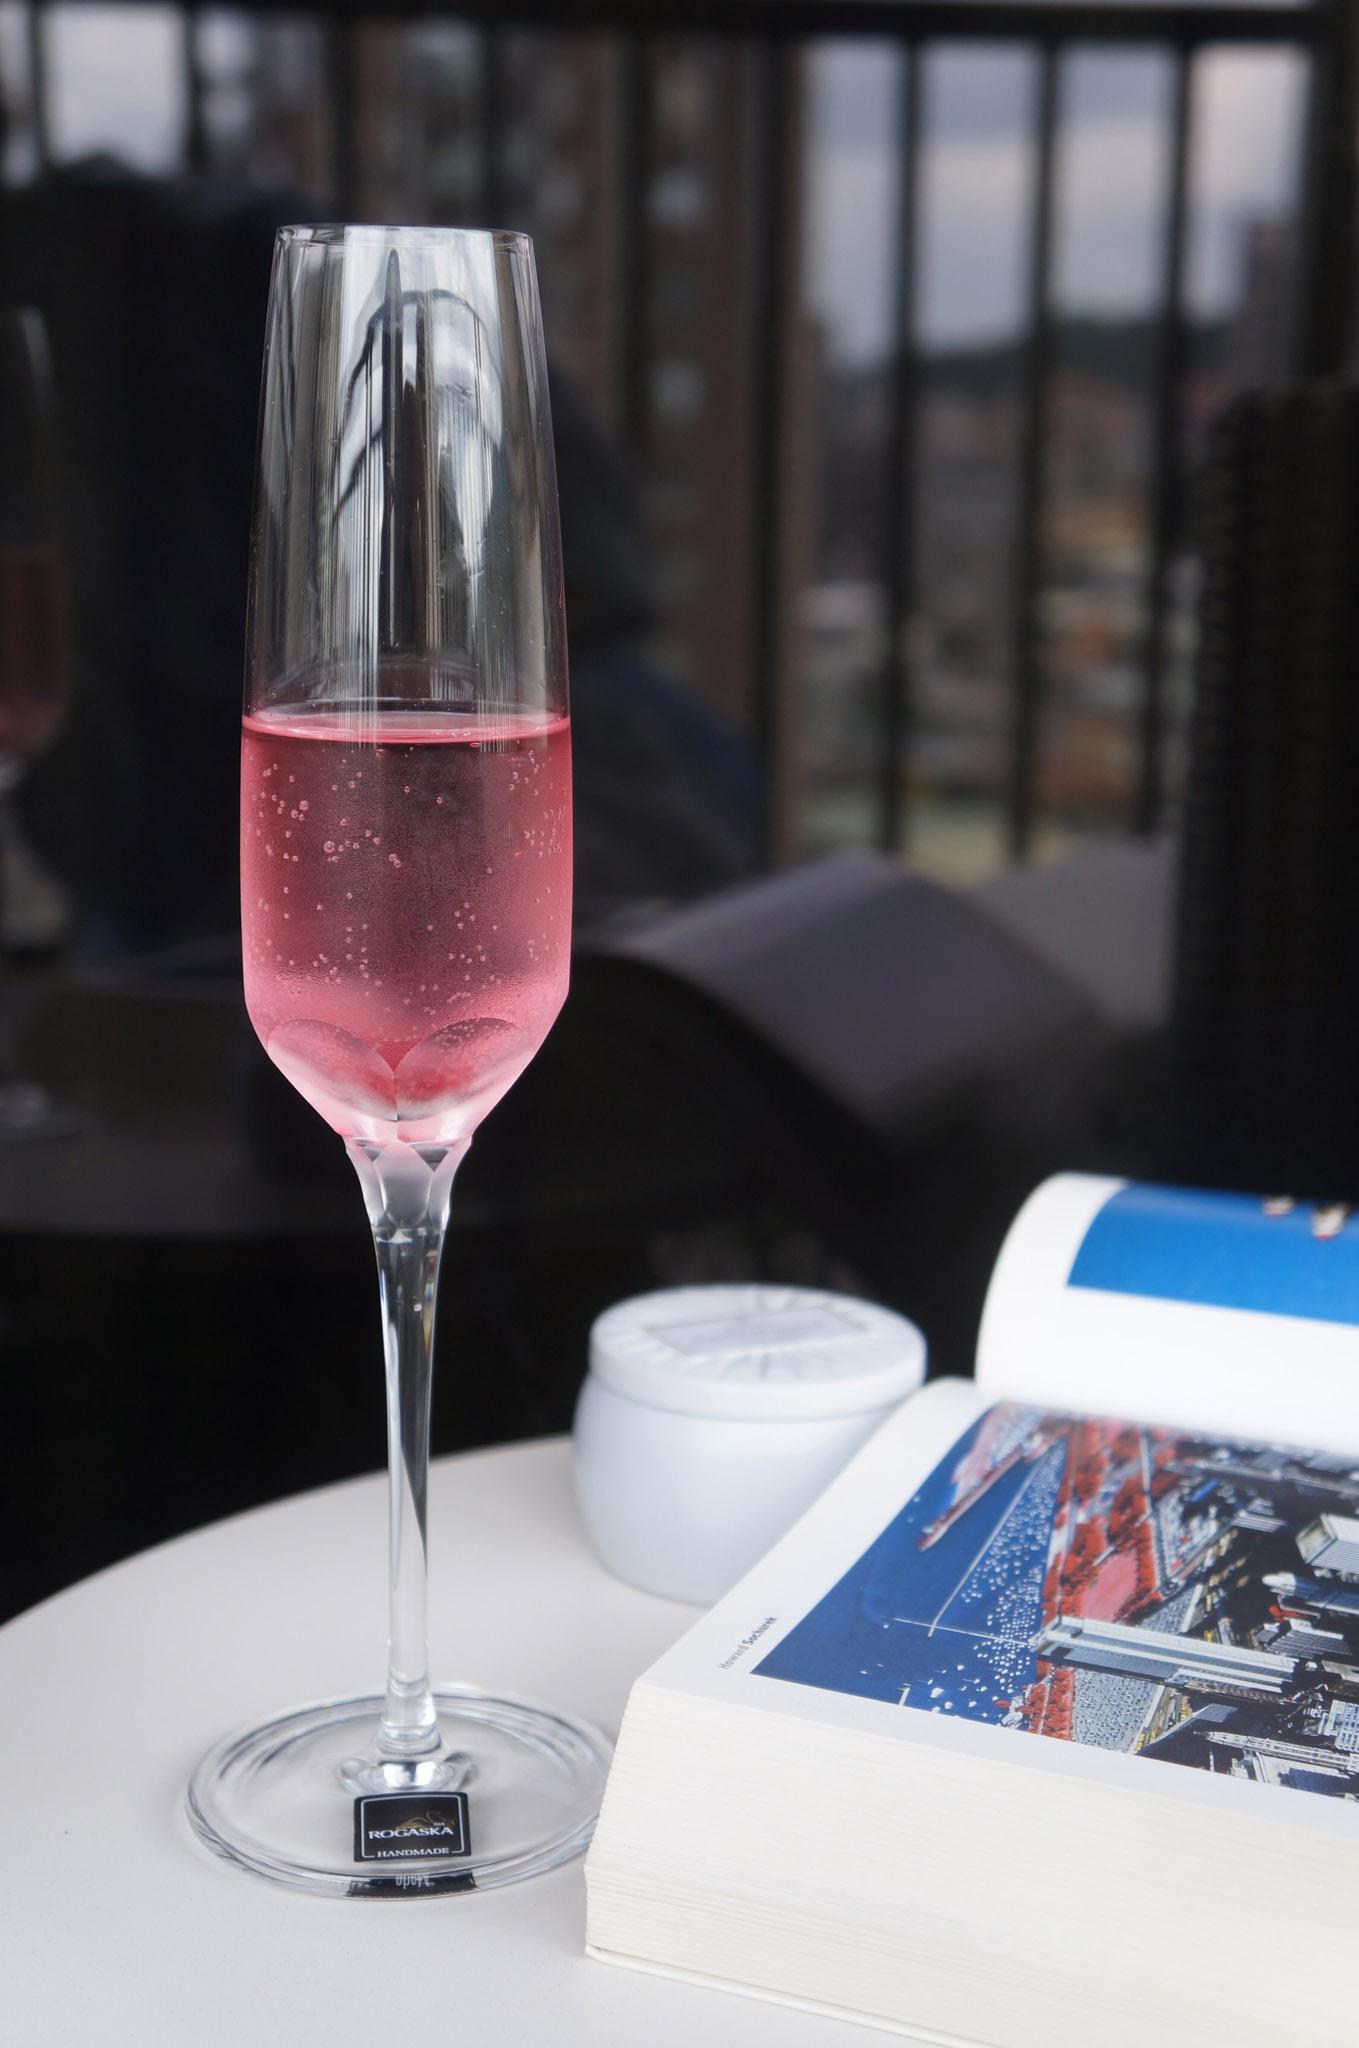 歐洲 ROGASKA 水晶玻璃 BLOSSOM 華麗綻放 香檳杯 2支裝